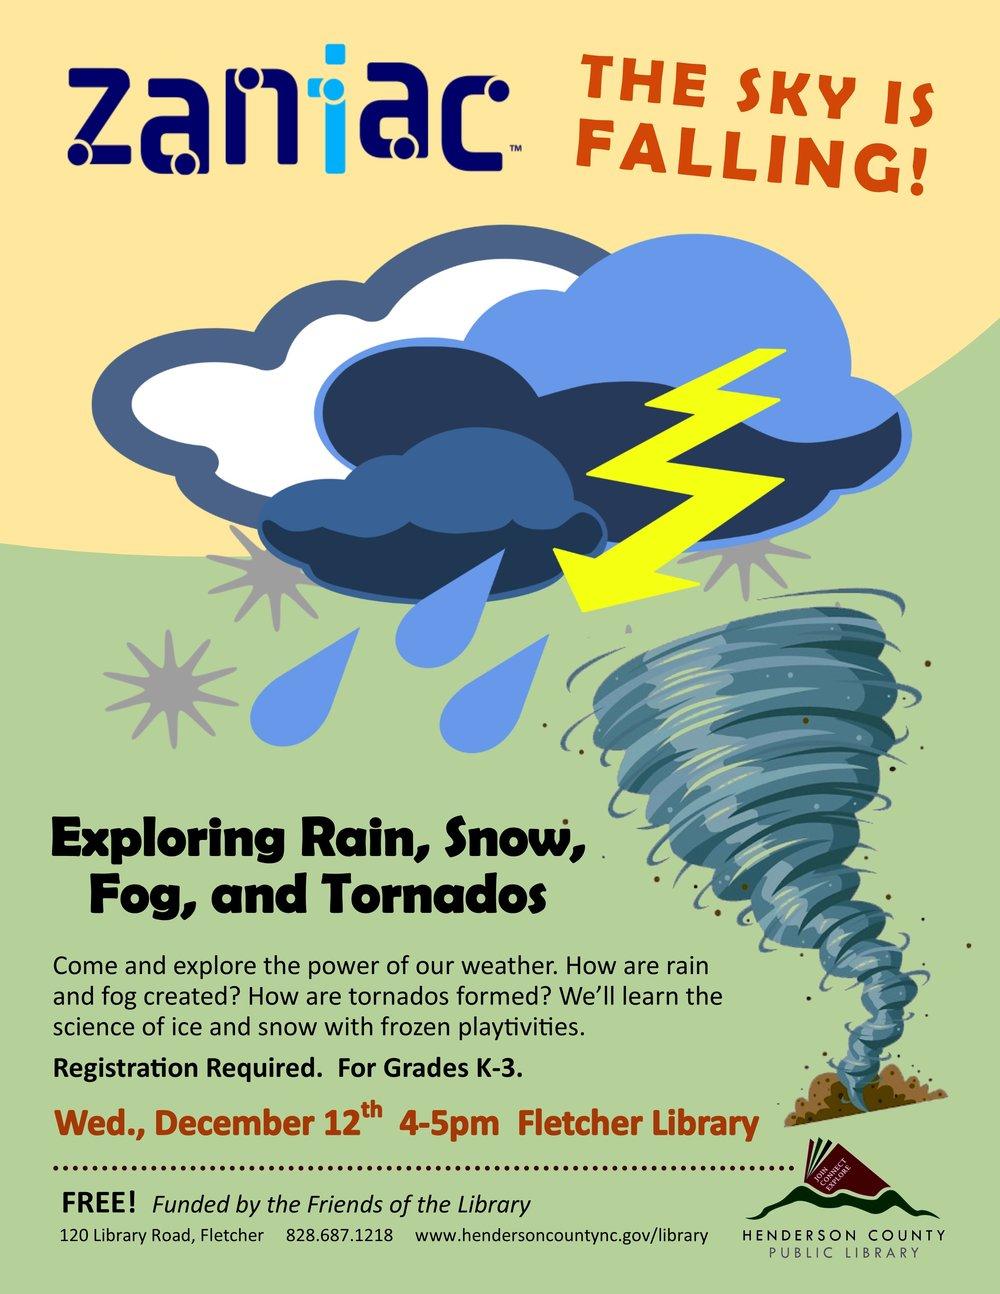 FL- Zaniac Sky is Falling.jpg